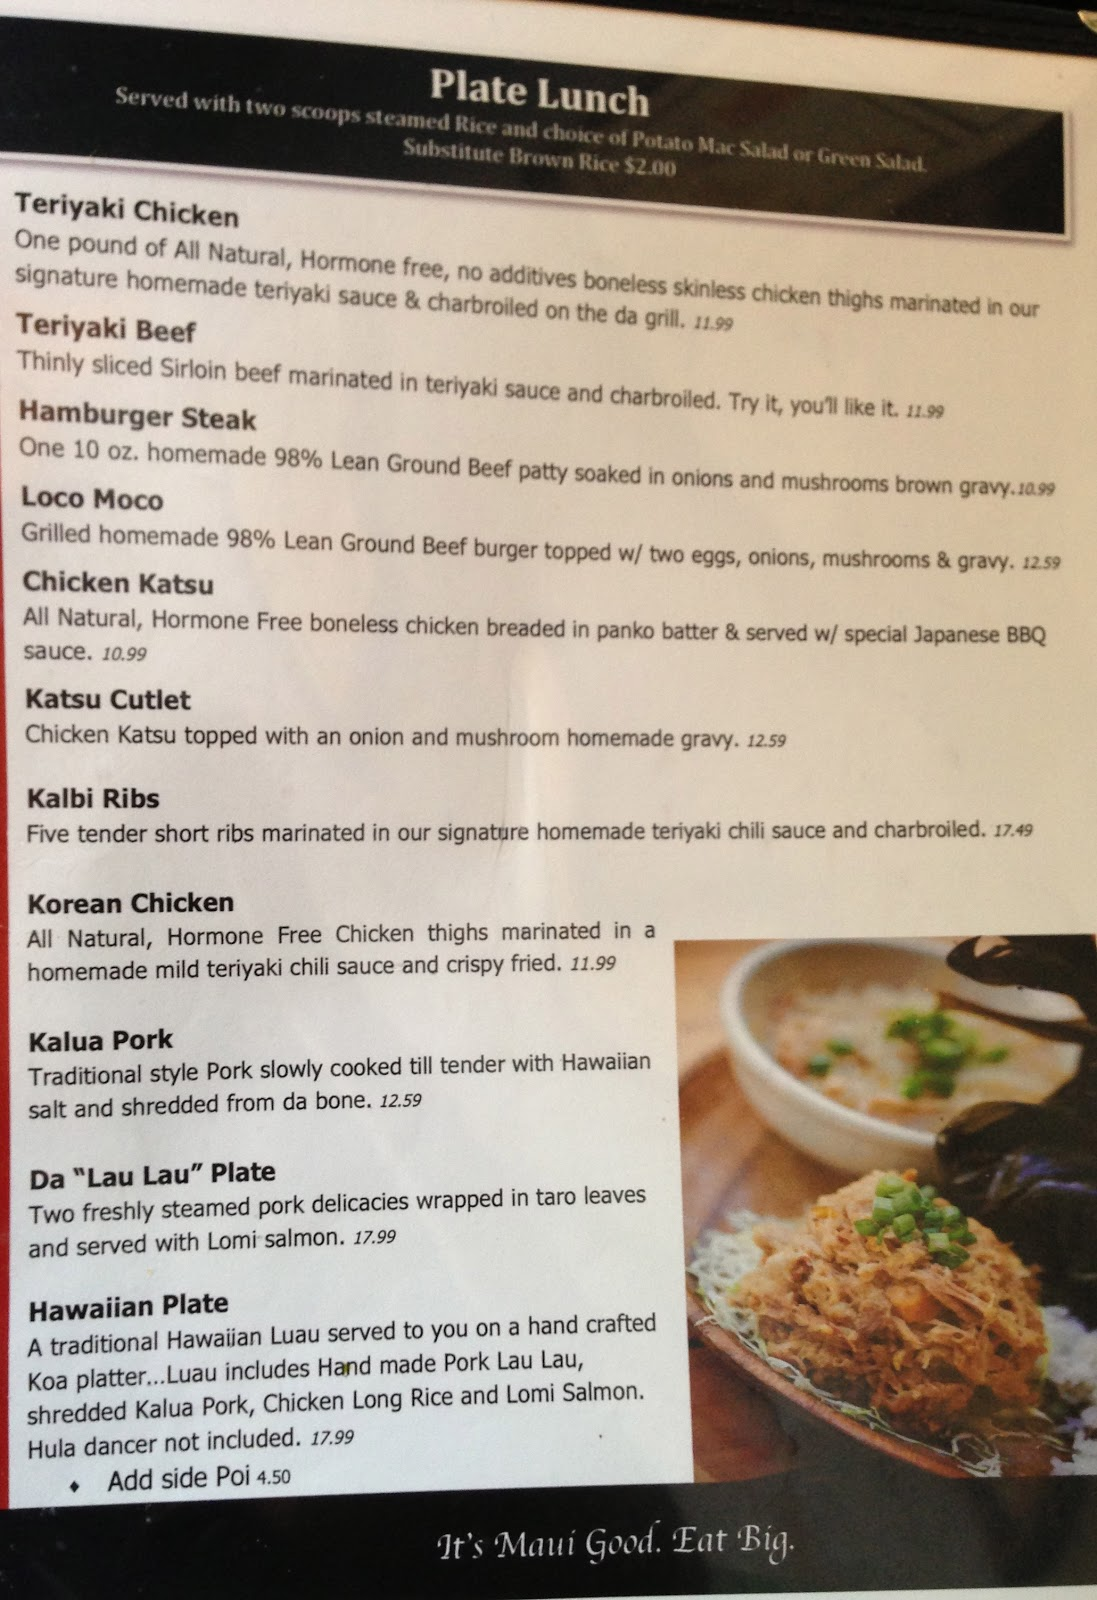 TASTE OF HAWAII: DA KITCHEN CAFE - KAHULUI, MAUI